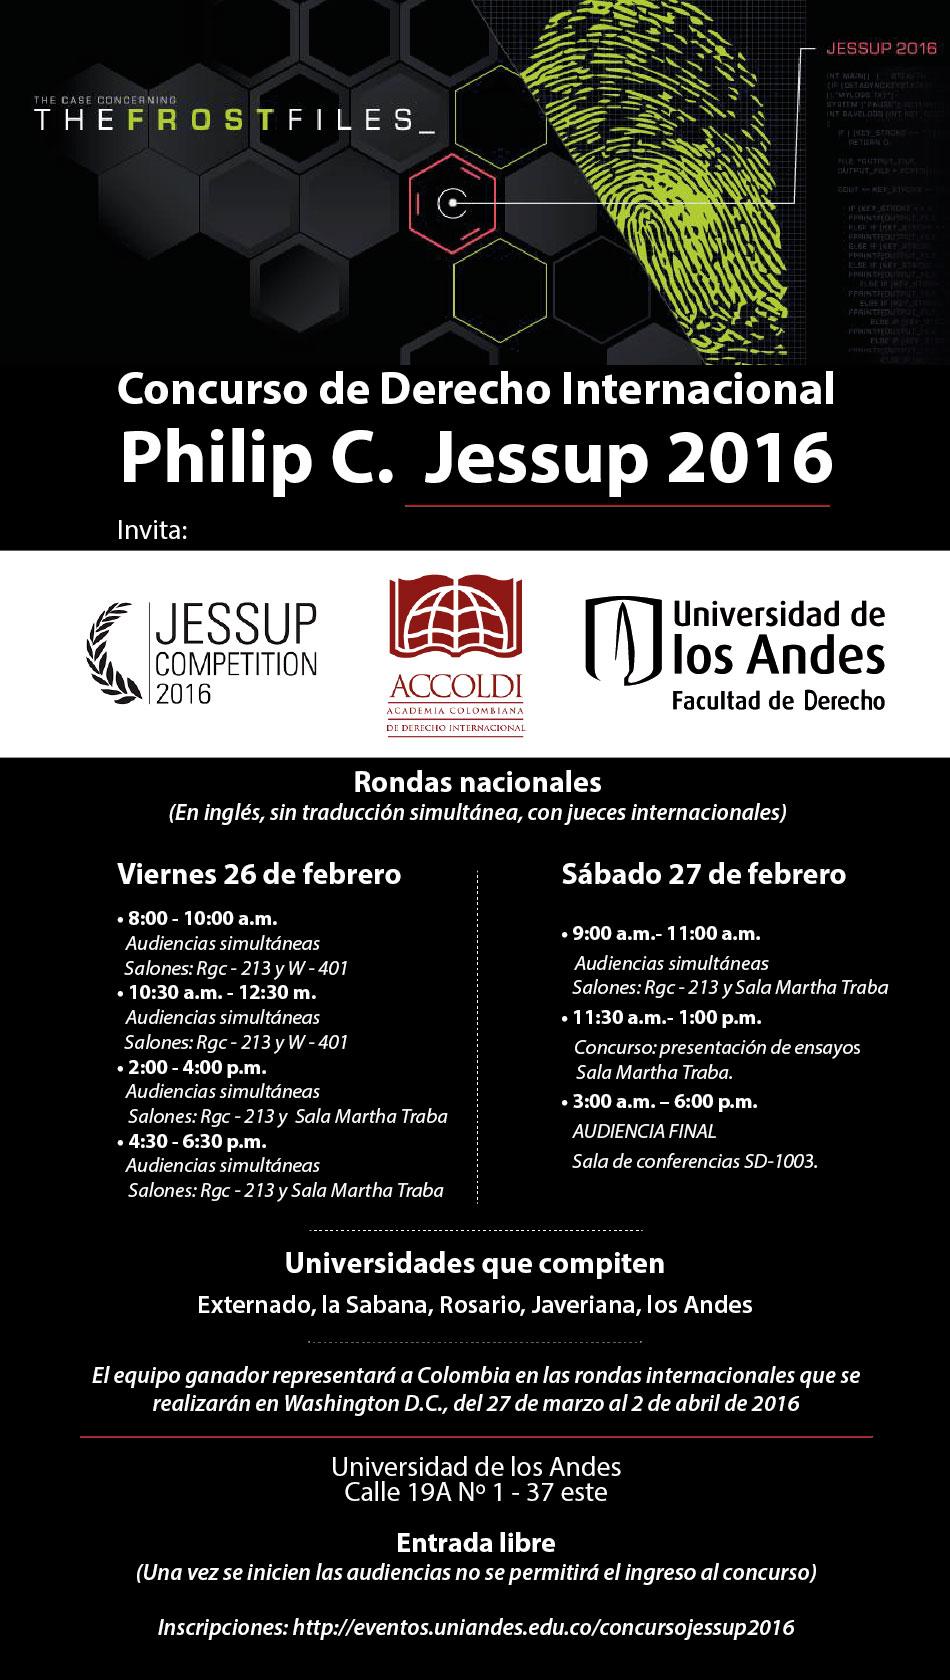 acedi-cilsa-jessup-2016-frost-files